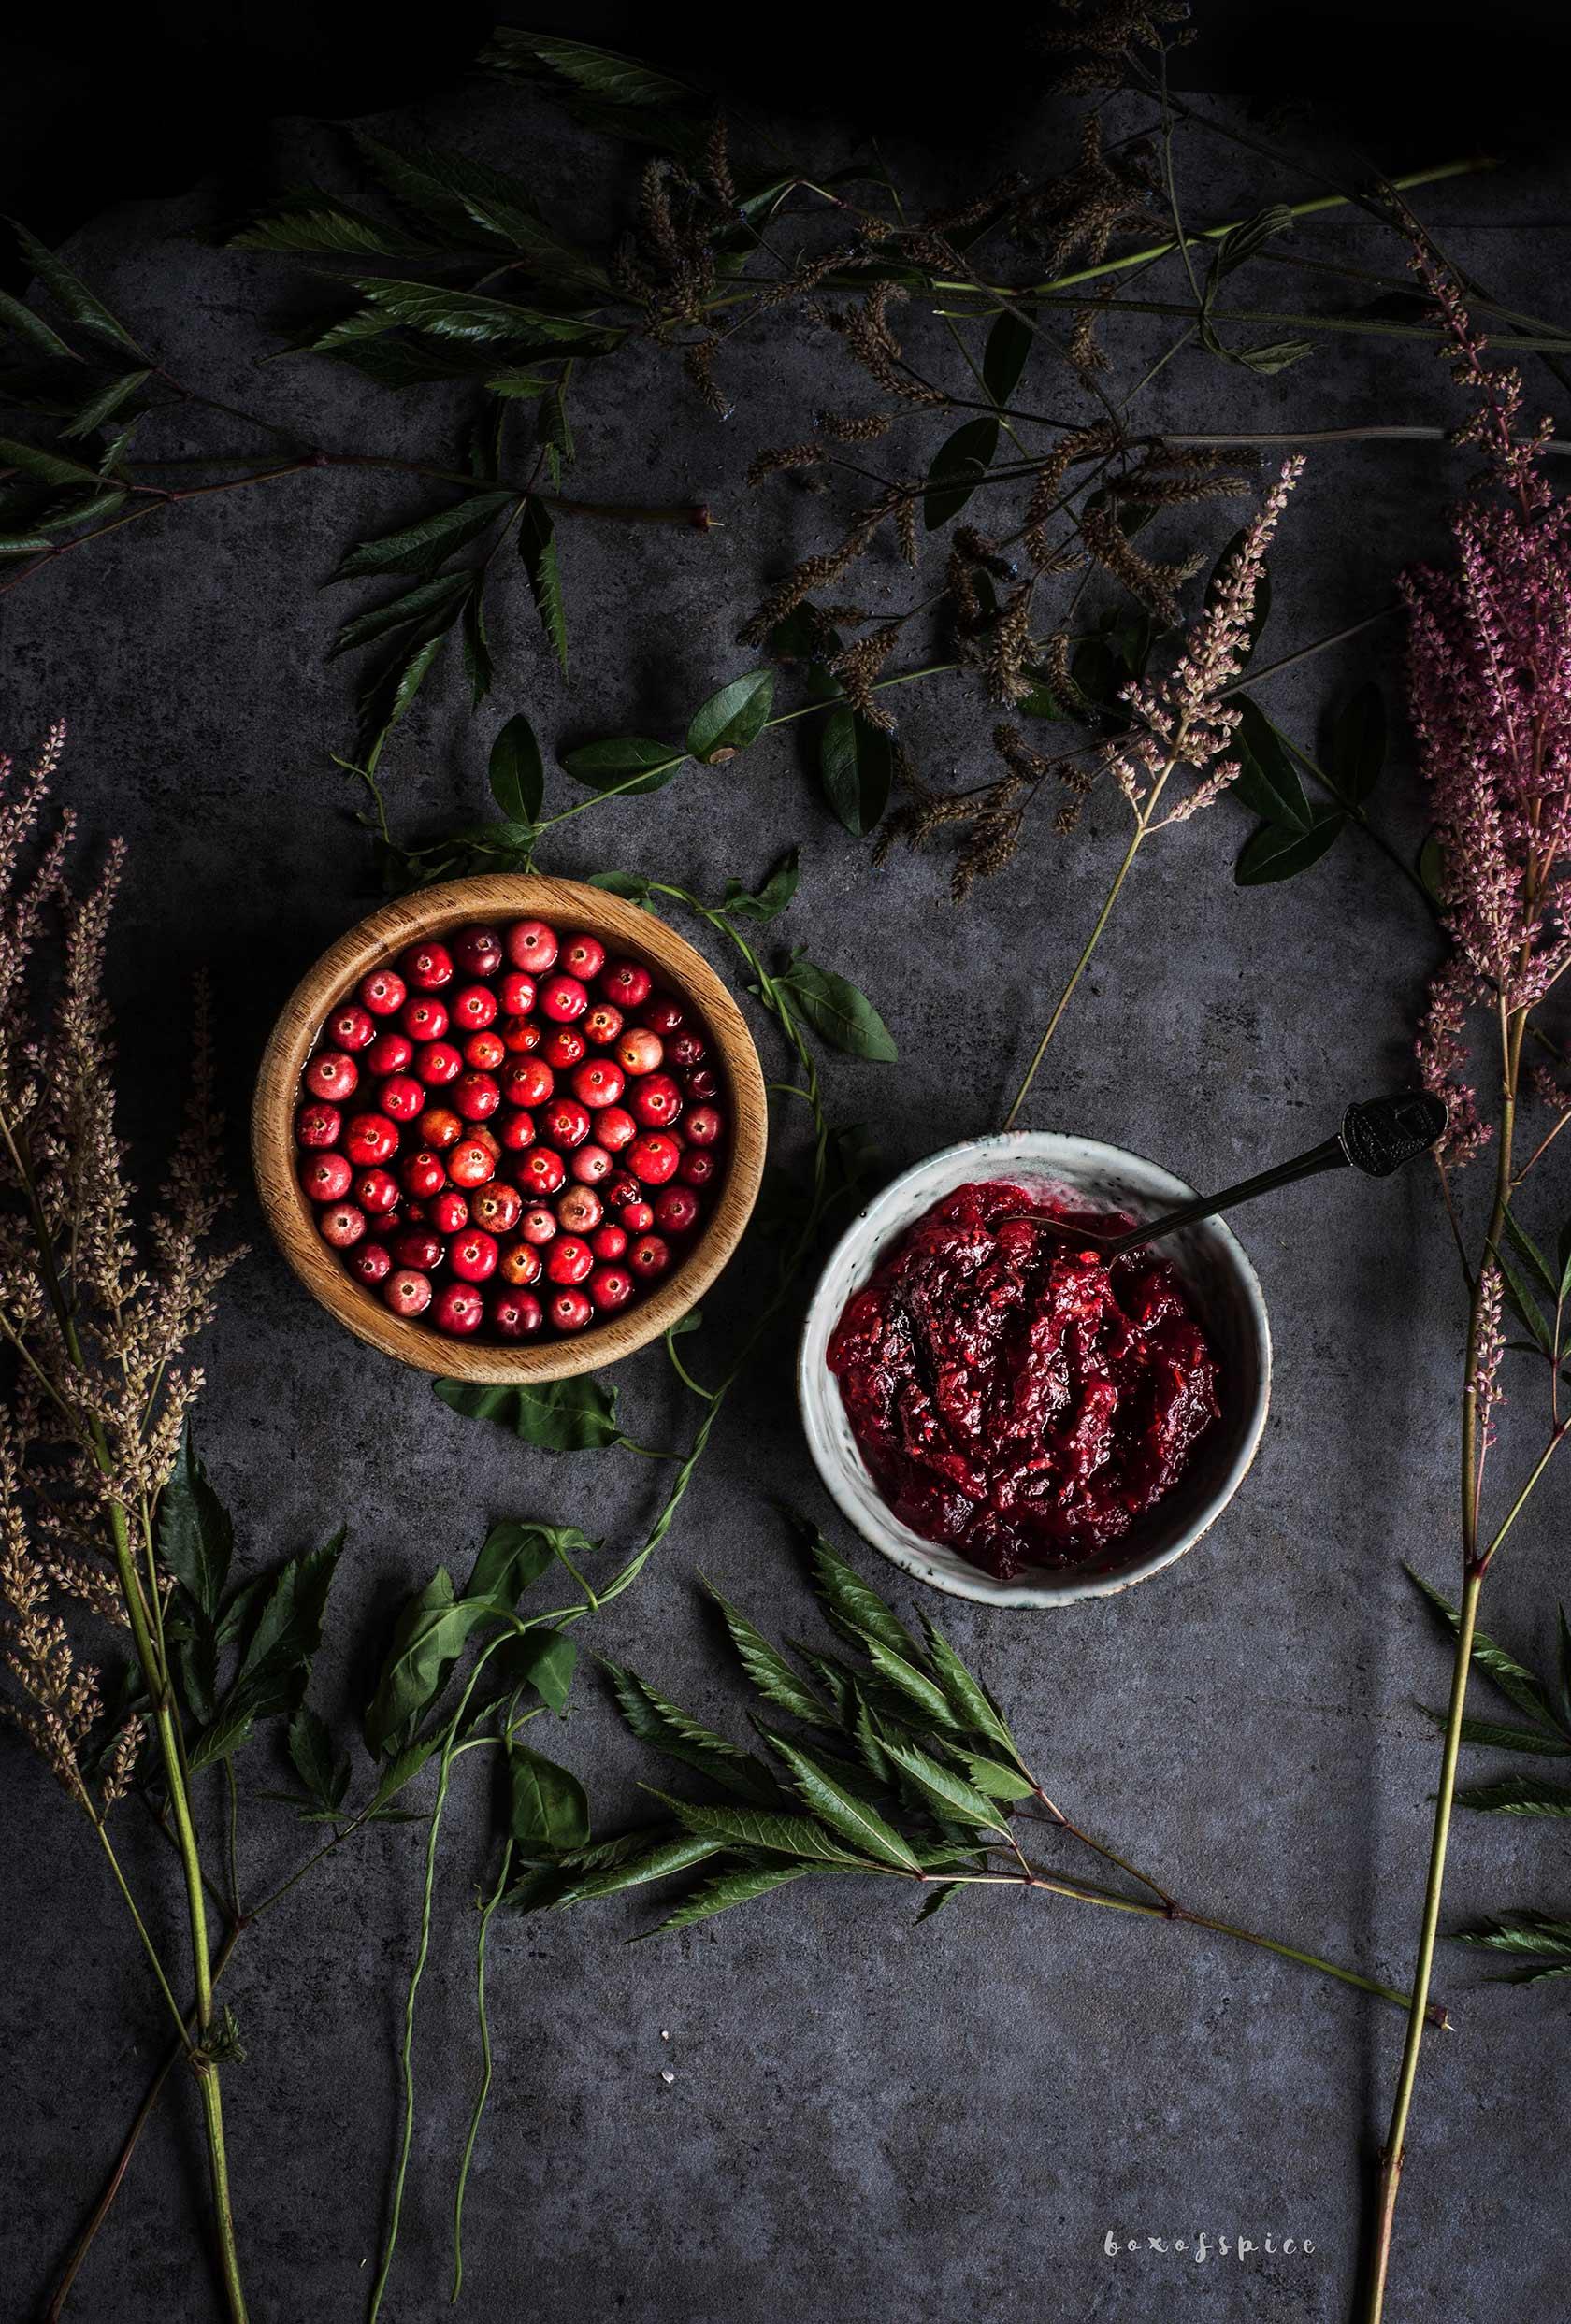 Burnt Garlic Sugar Snaps with Cranberry Chutney I Boxofspice